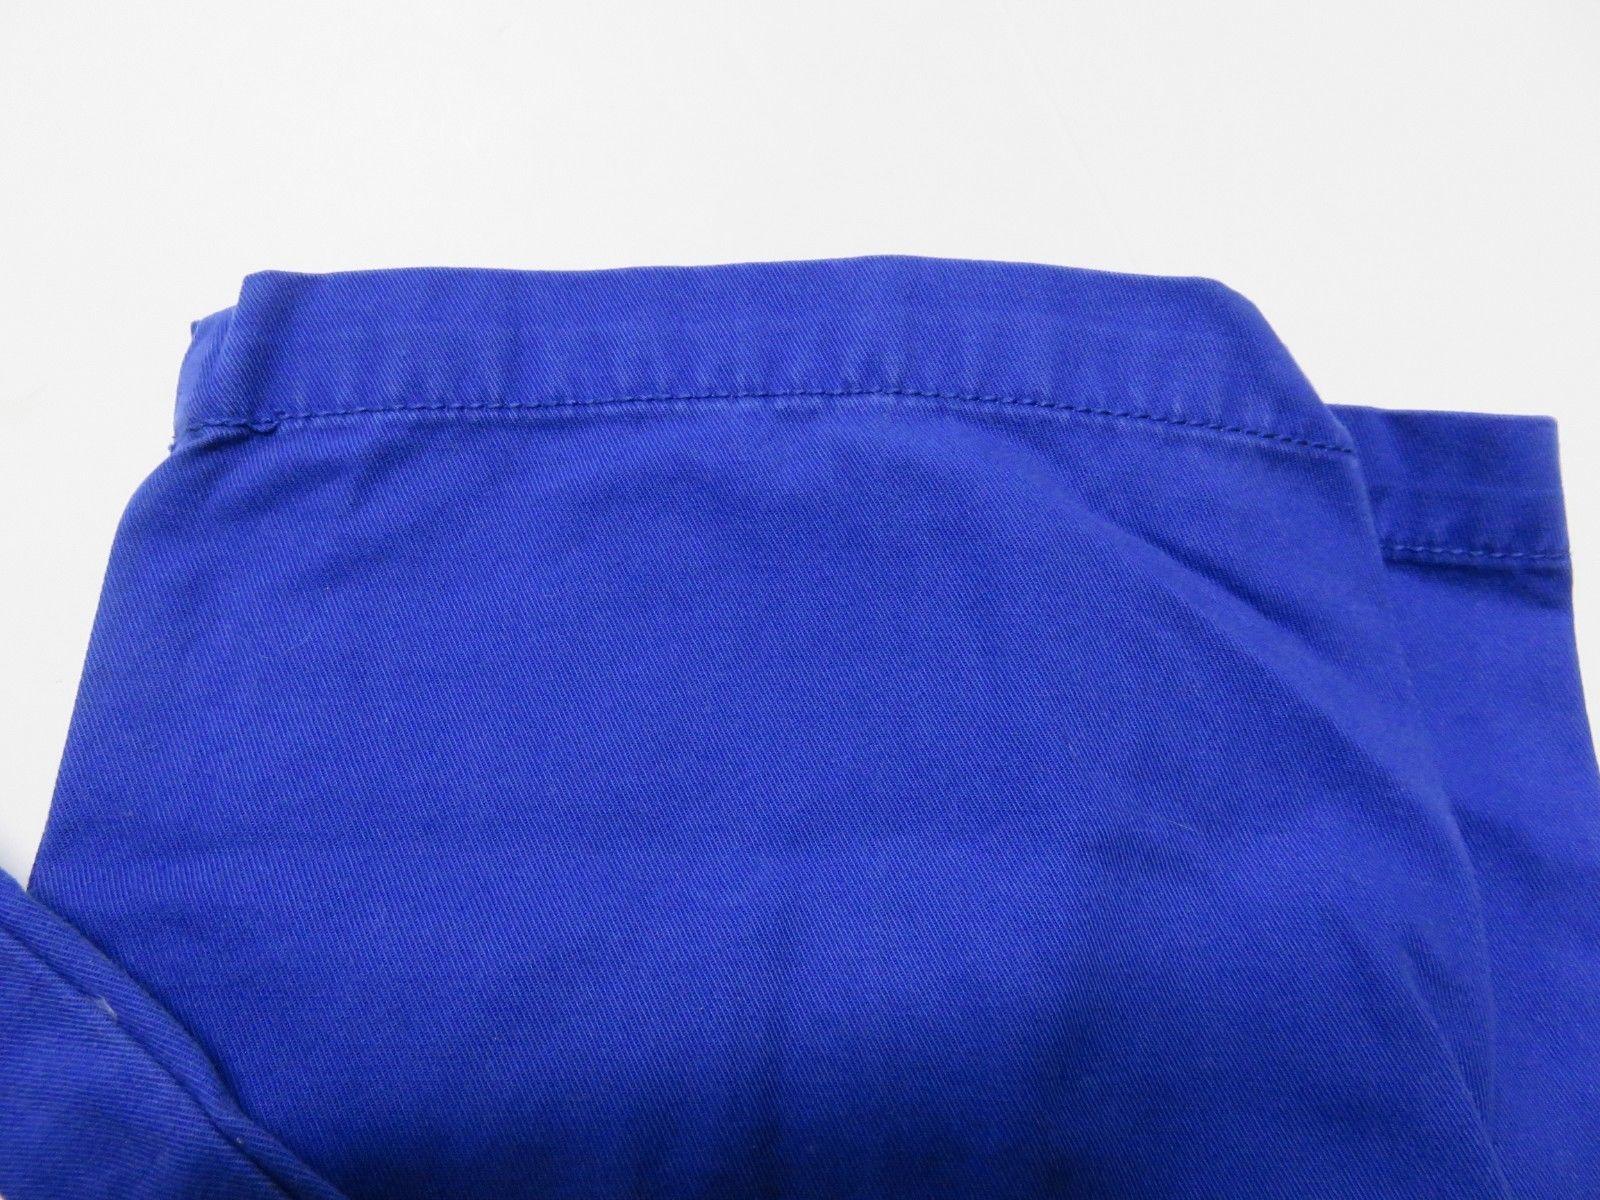 NOS w/ TAGS IZOD Saltwater Mazarine Blue Men's Straight Fit Pants Size W34 L29 image 3